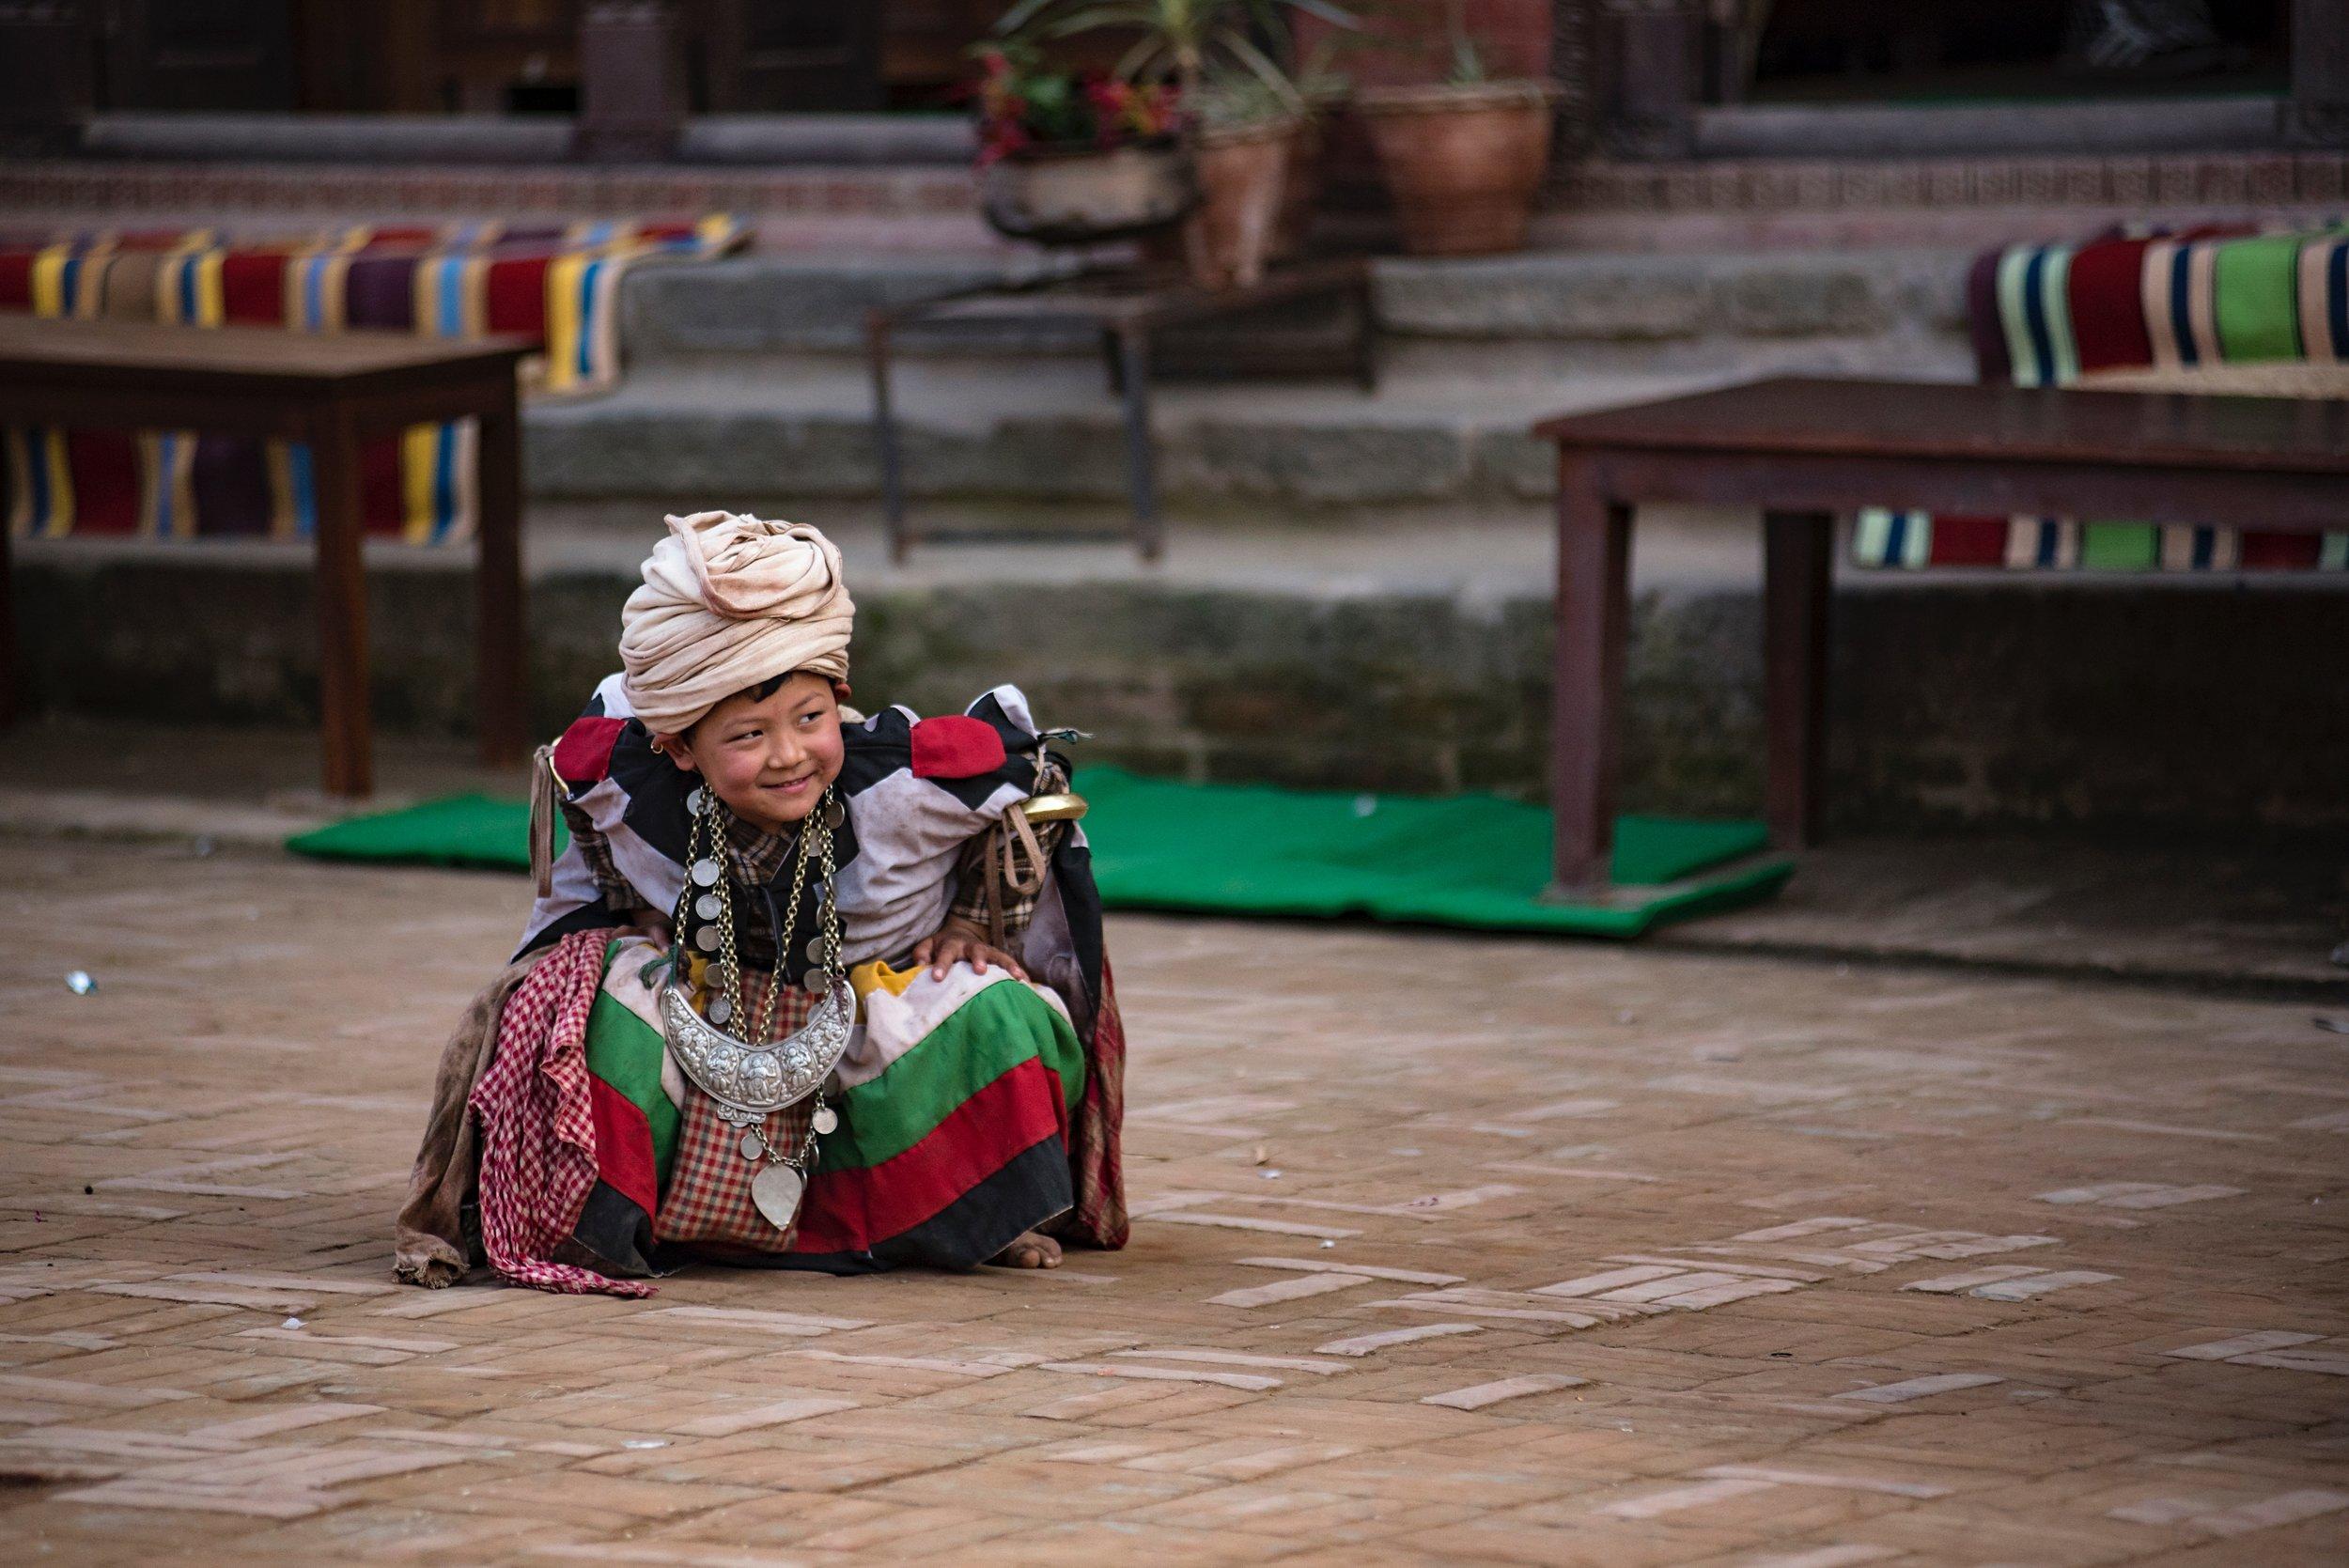 photos-of-nepal-532329-unsplash.jpg